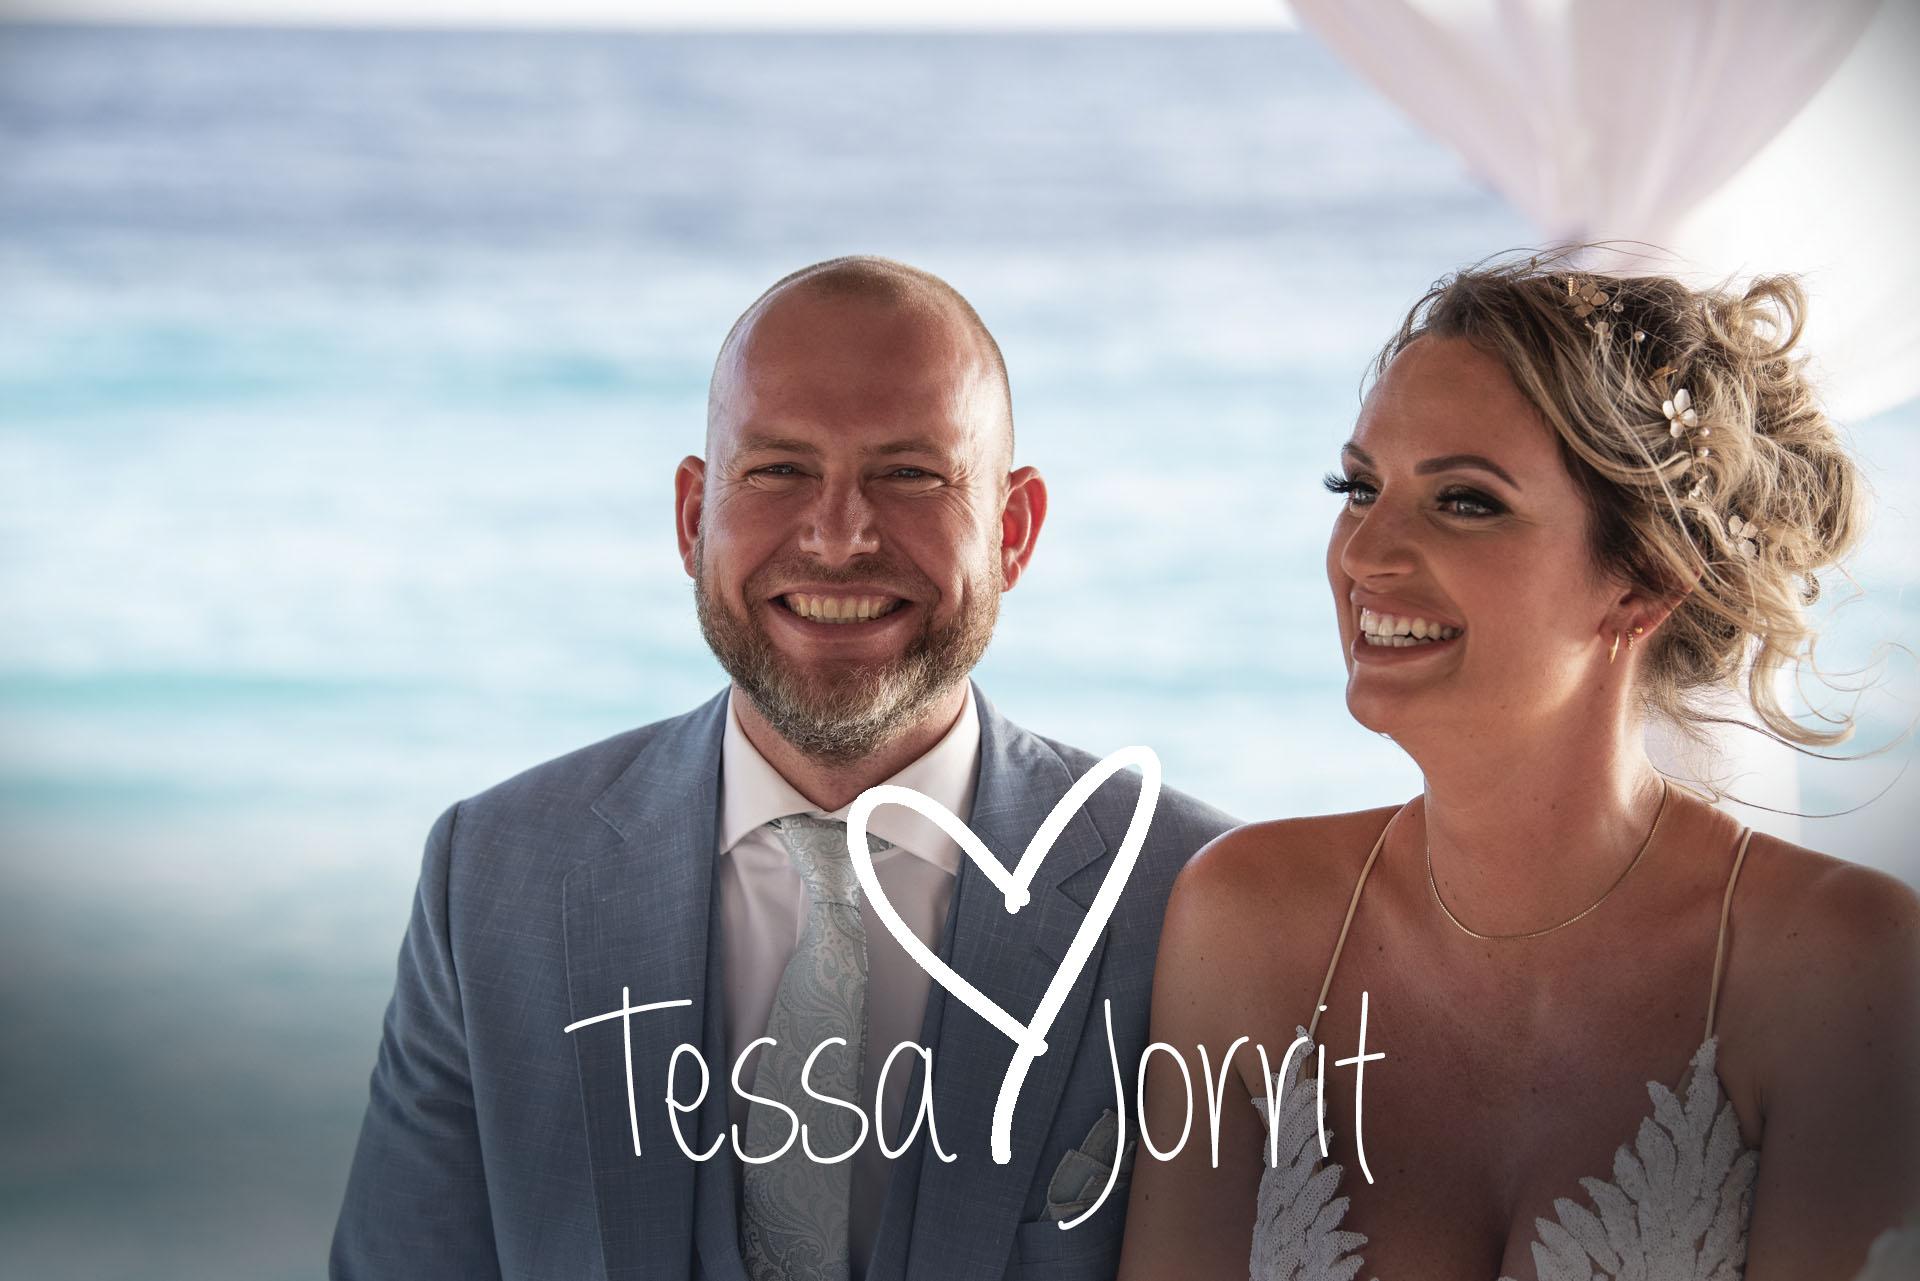 Tessa & Jorrit